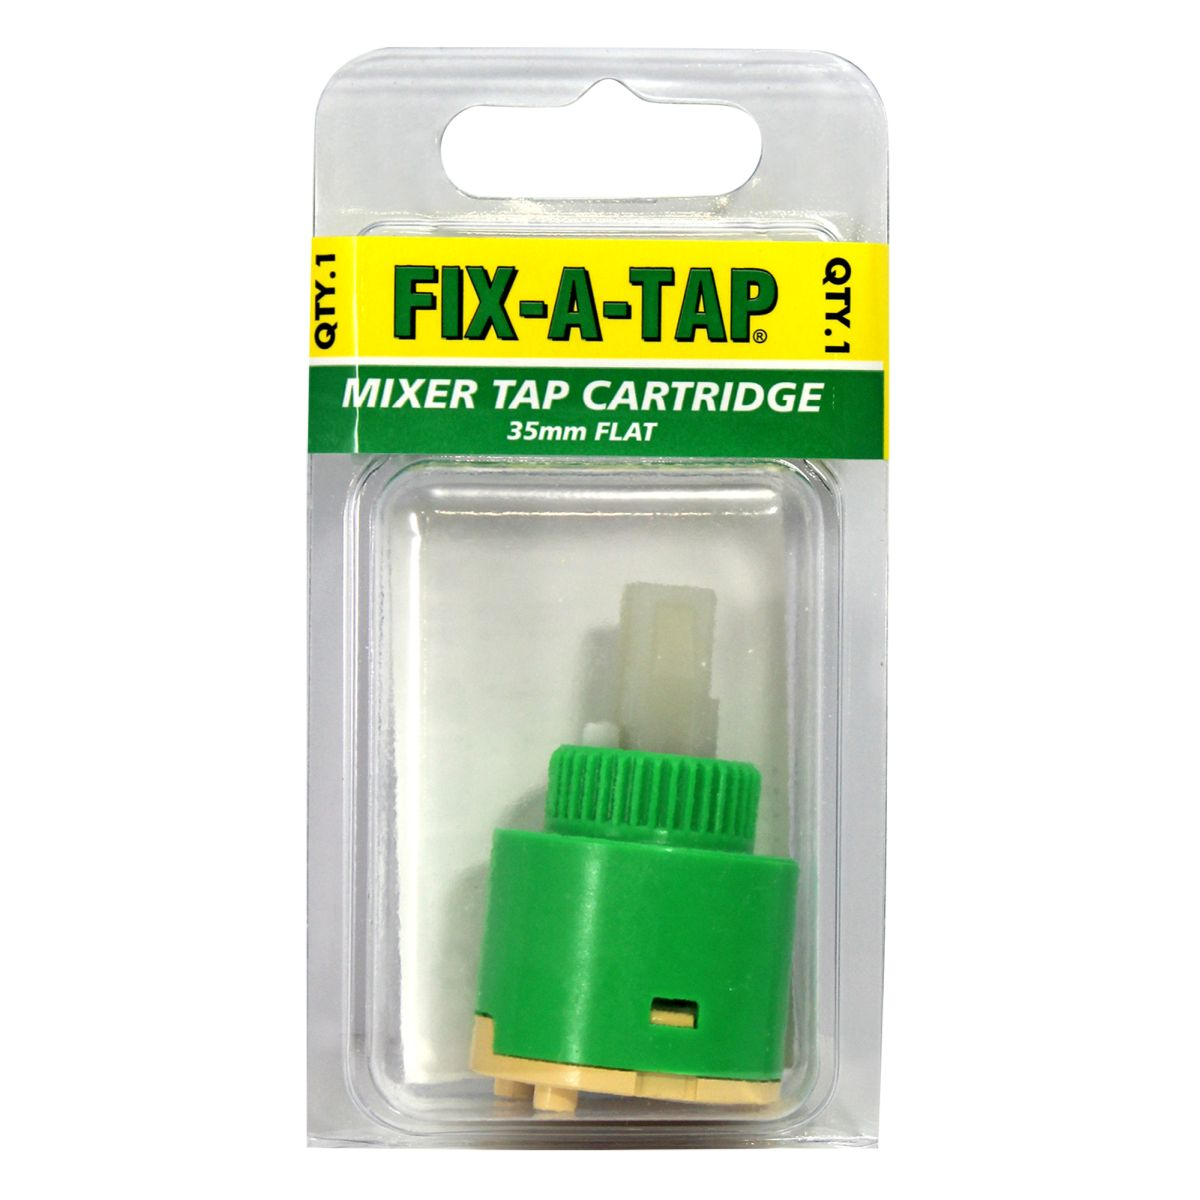 FIX-A-TAP Mixer Tap Cartridge 35mm